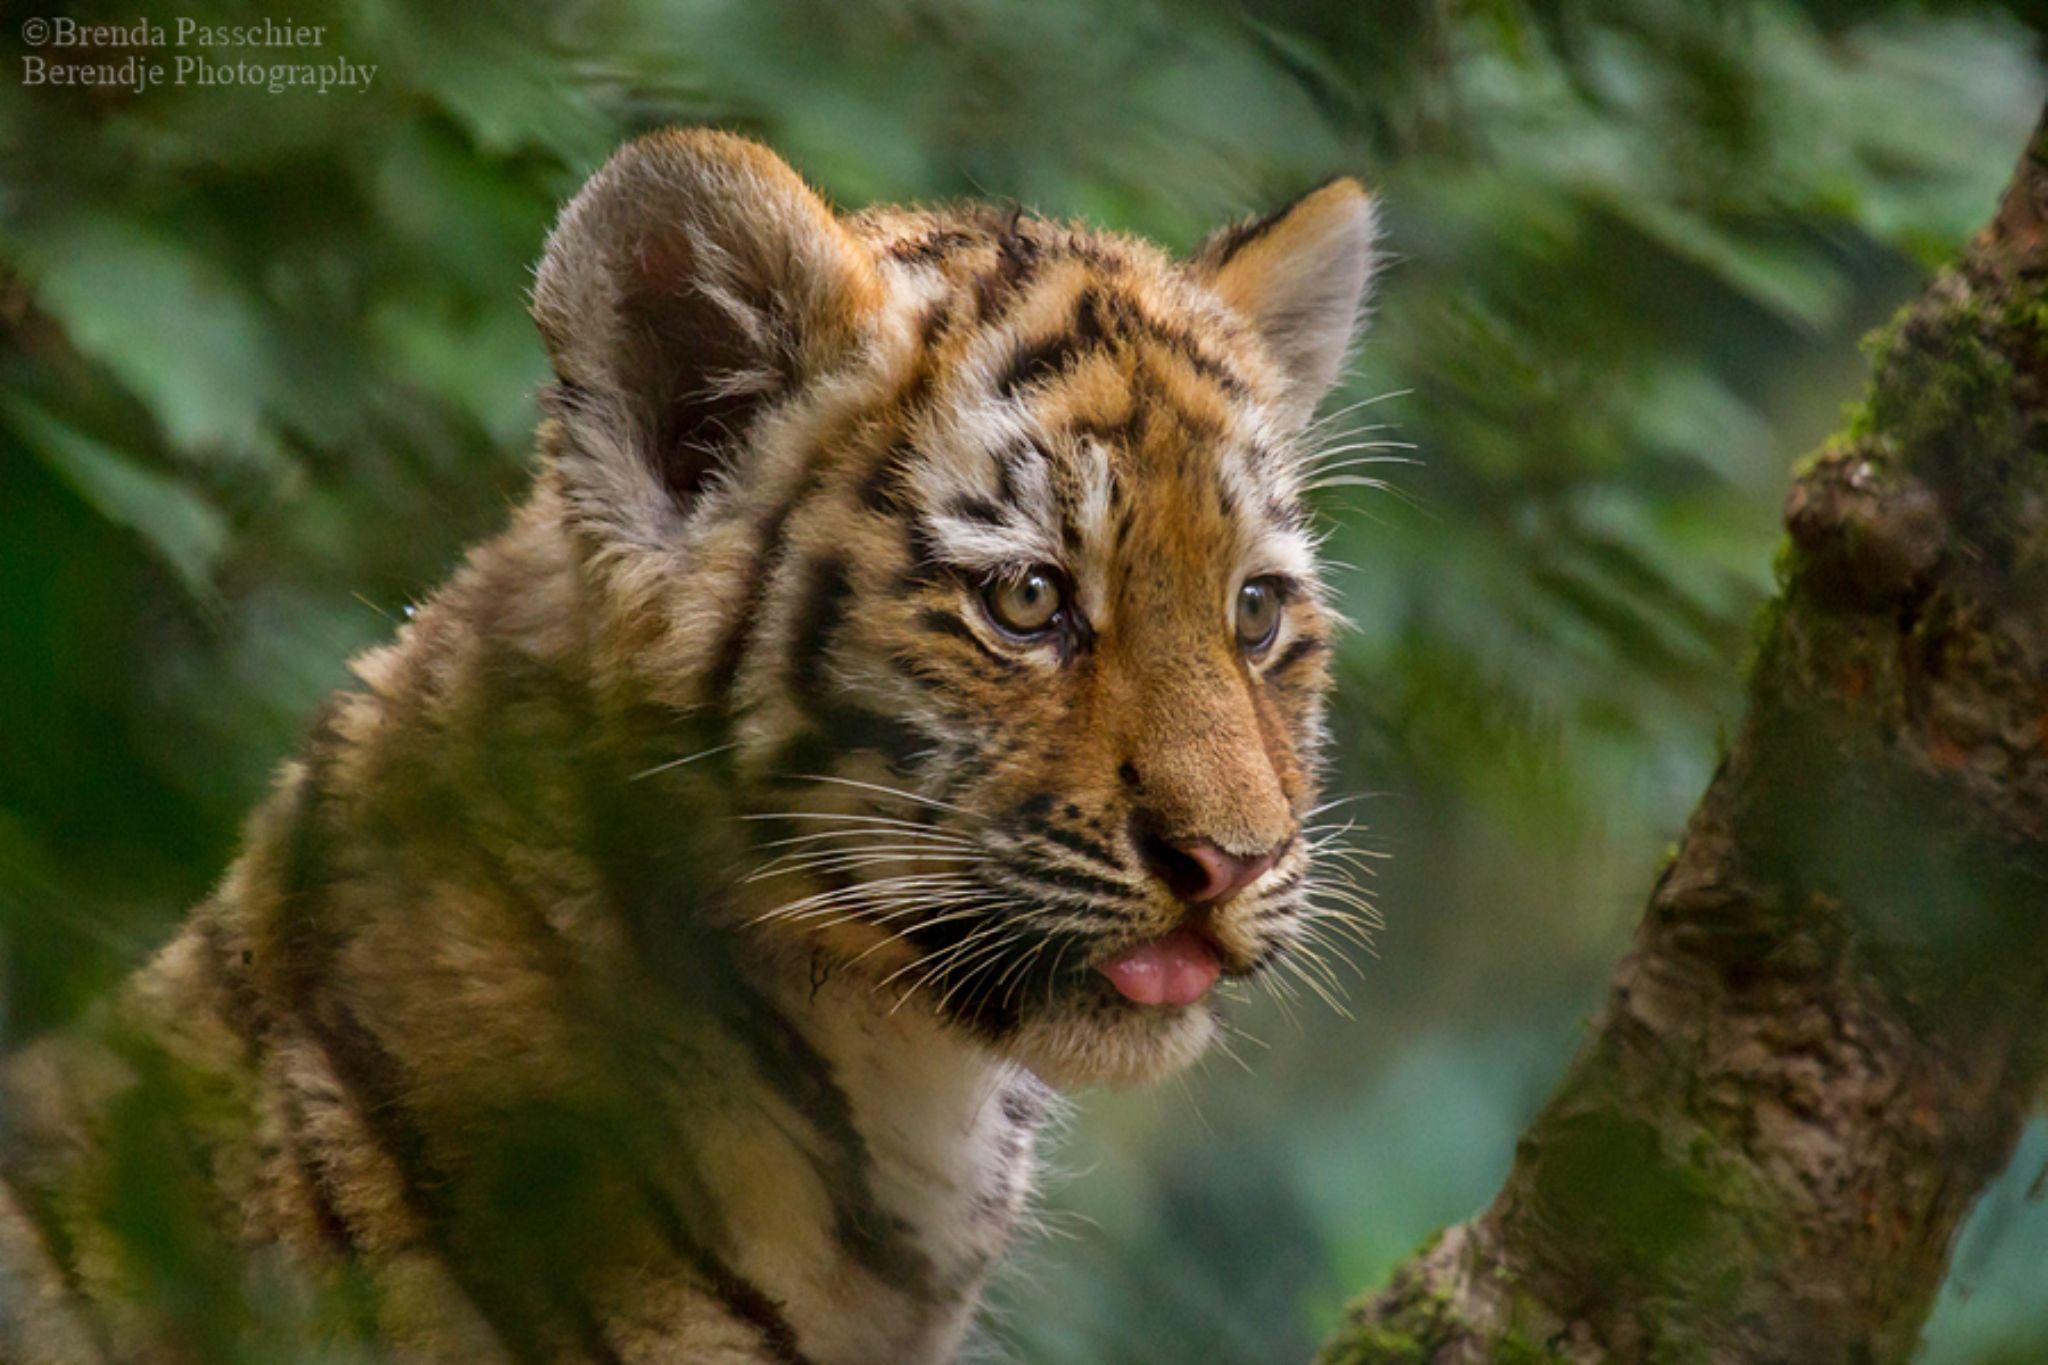 Little Tiger by Brenda Passchier